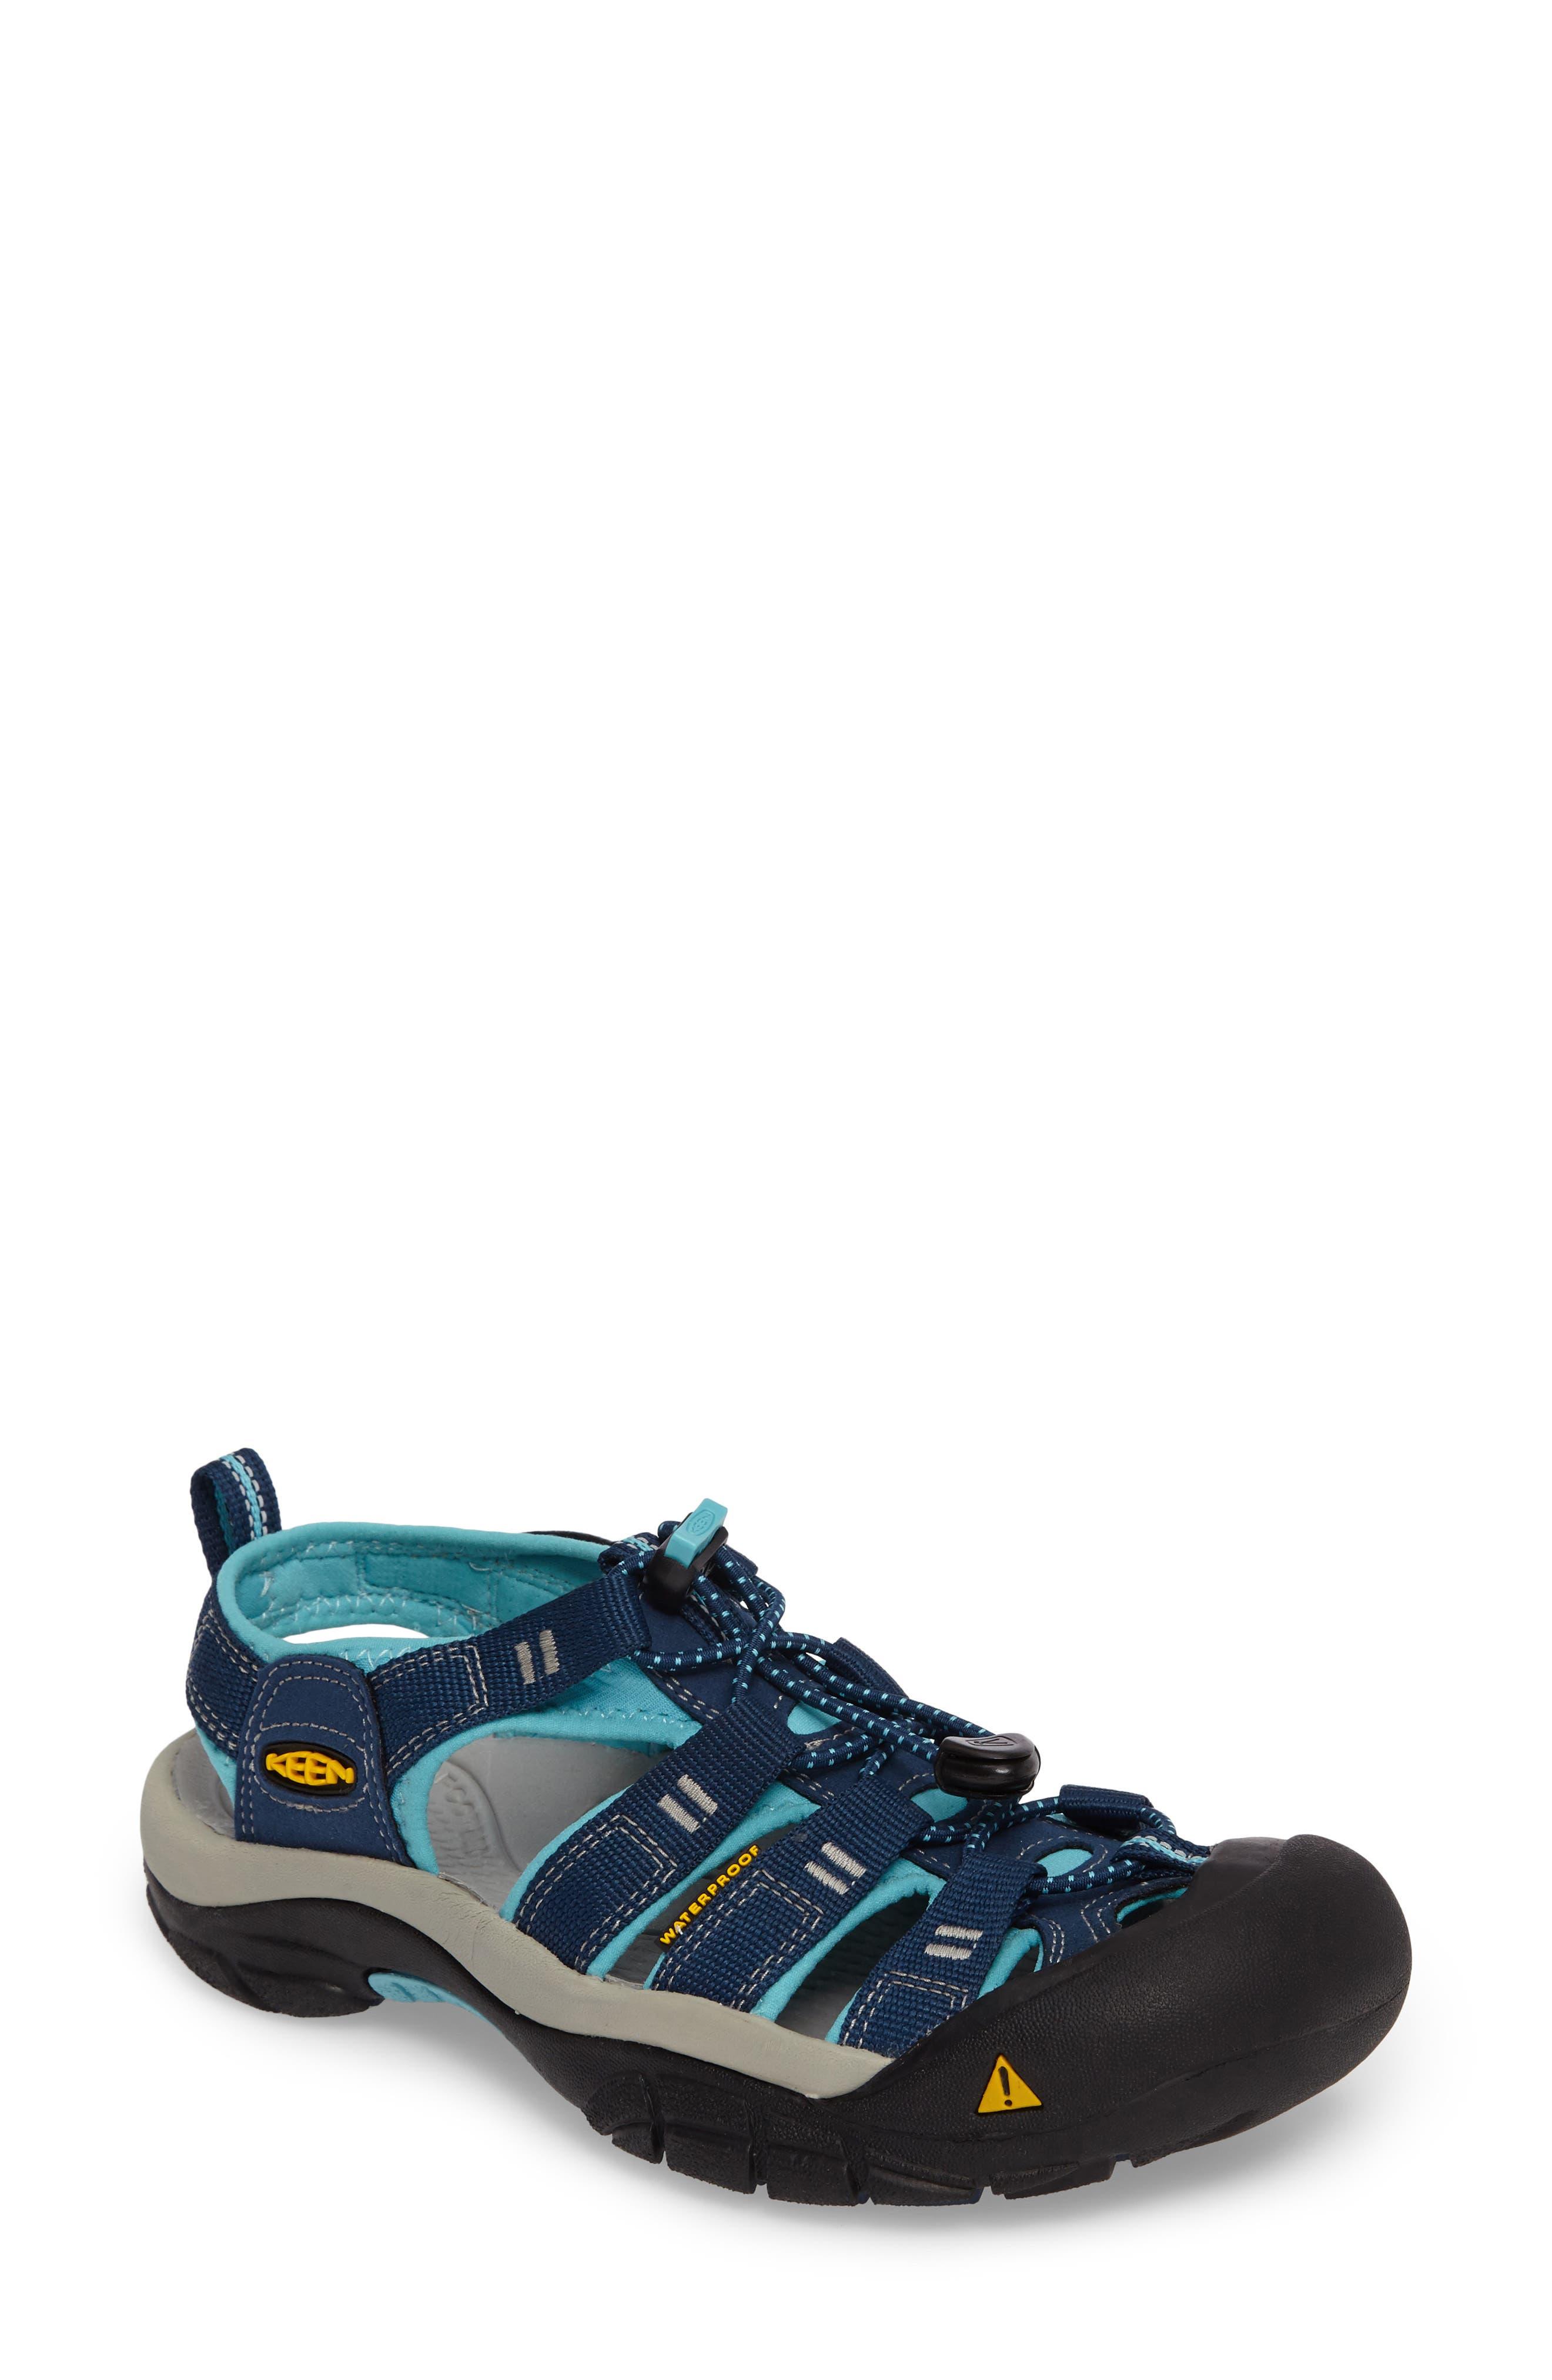 Alternate Image 1 Selected - Keen 'Newport H2' Sandal (Women)